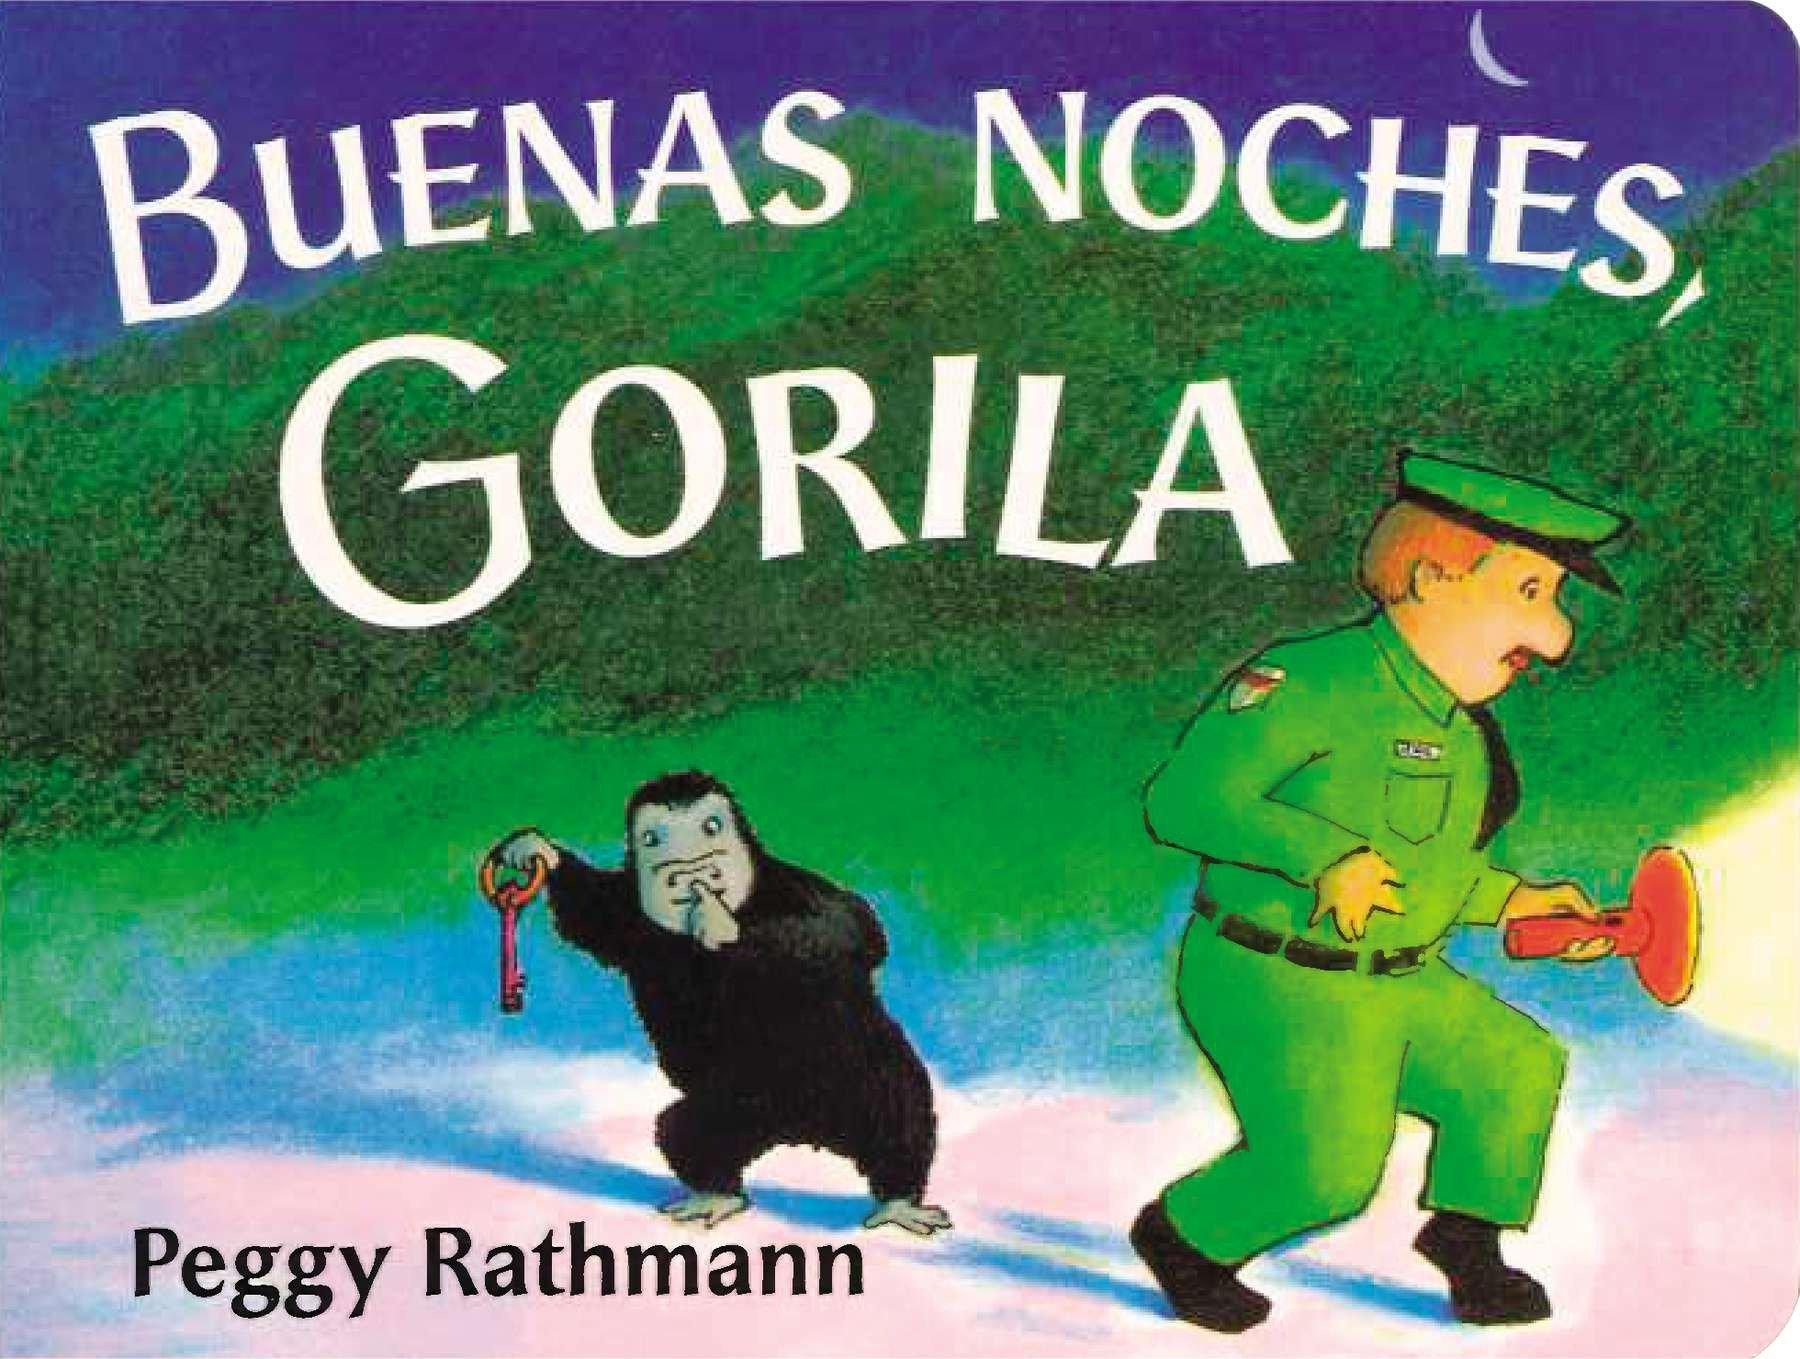 Buenas noches, Gorila (Spanish Edition): Peggy Rathmann: 9780399243004:  Amazon.com: Books